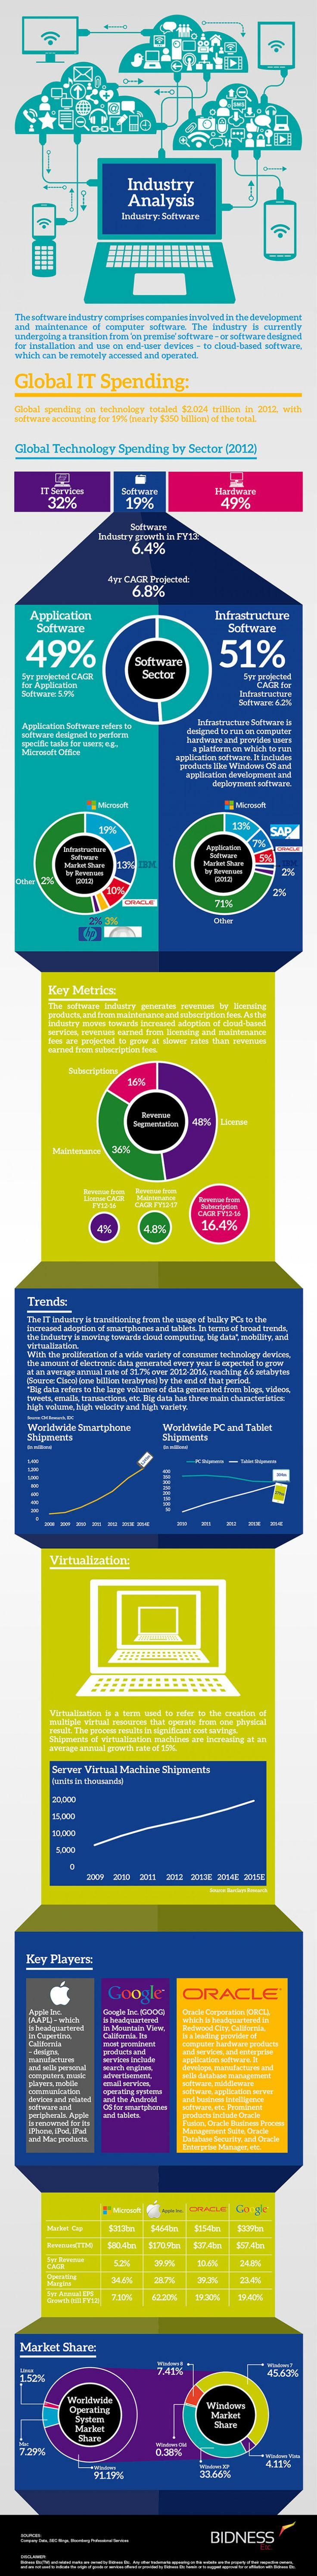 Microsoft (MSFT) Industry Analysis